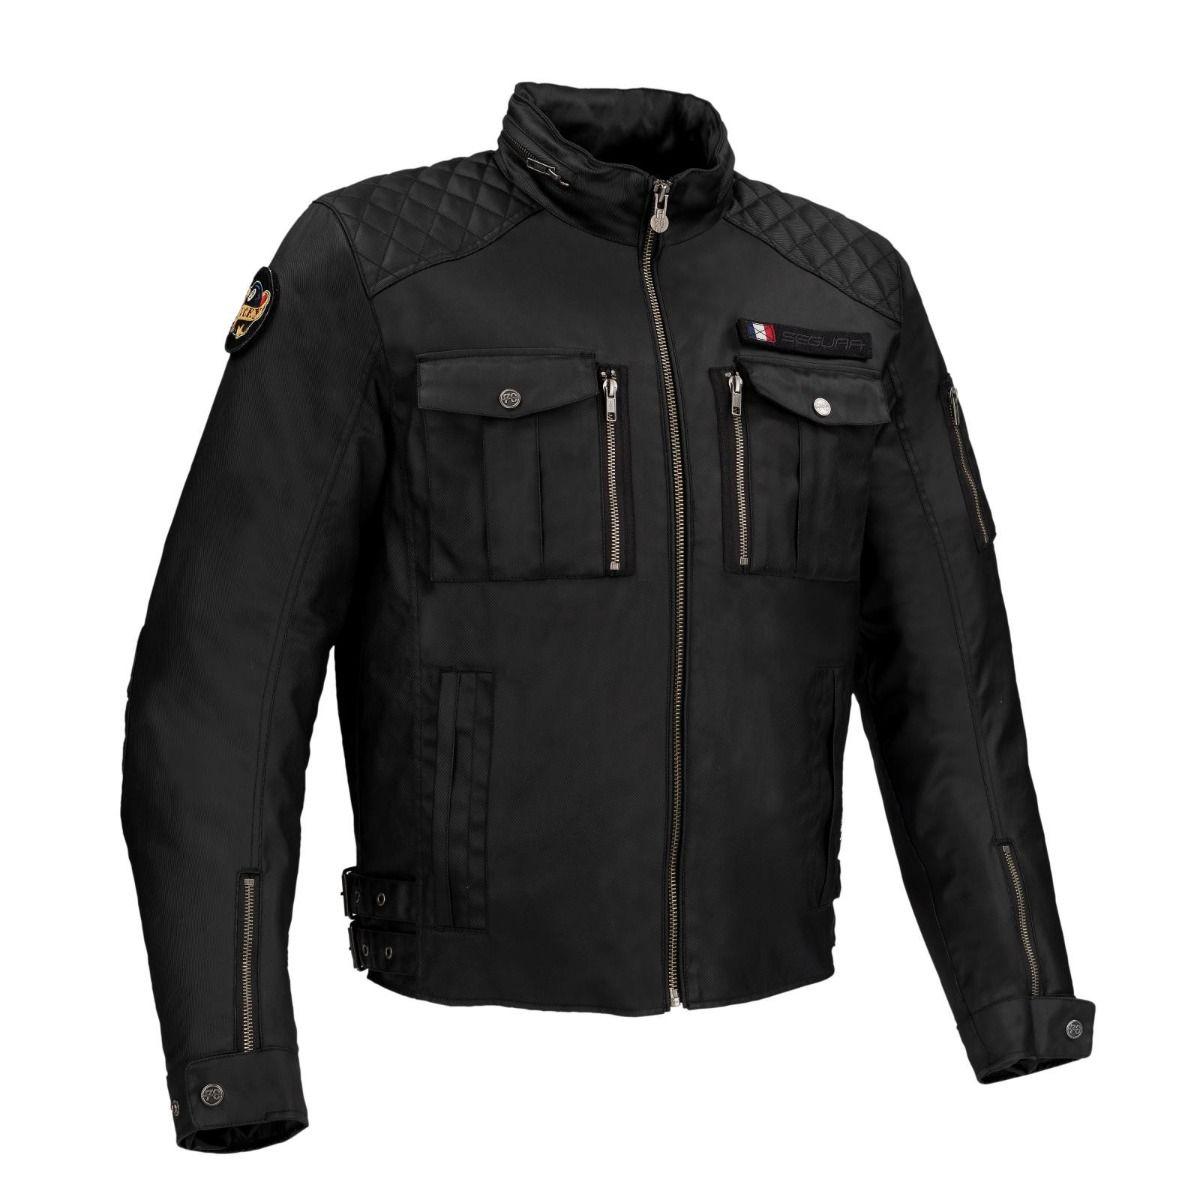 Segura Jericho Black Jacket